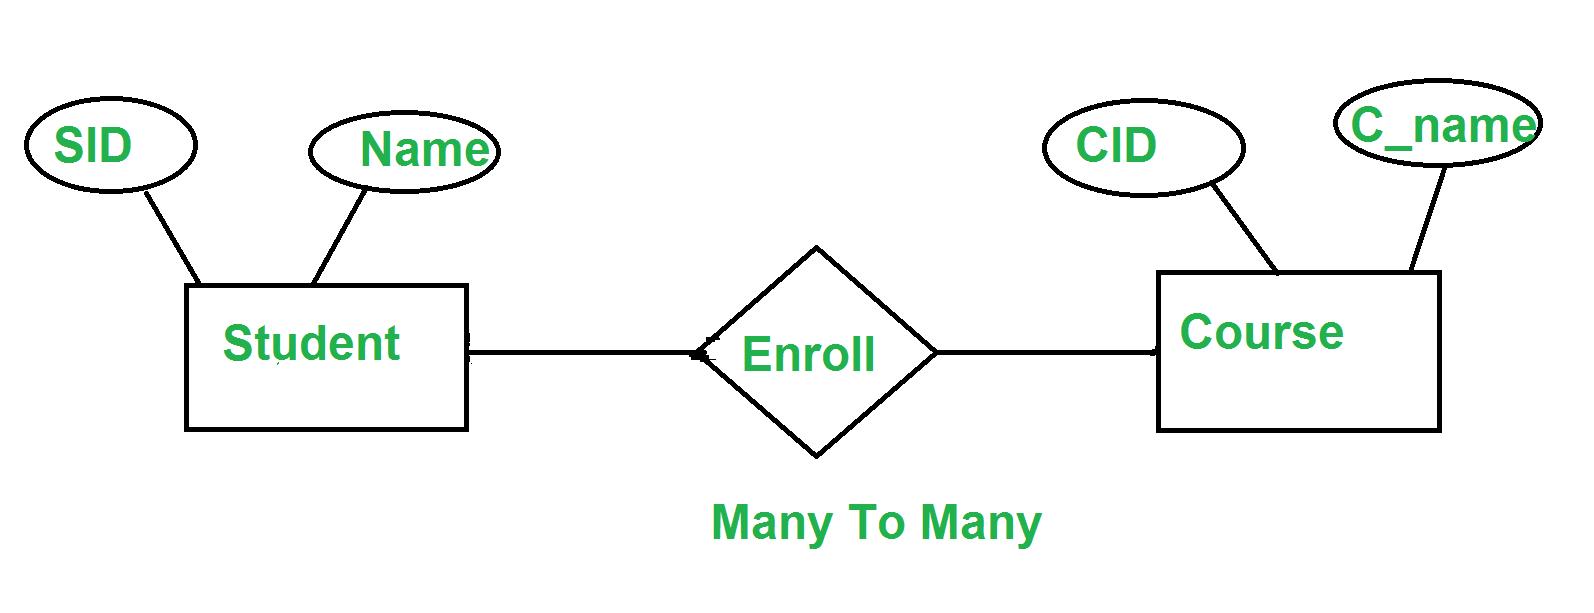 Minimization Of Er Diagrams - Geeksforgeeks regarding Er Diagram Many To Many Relationship Example